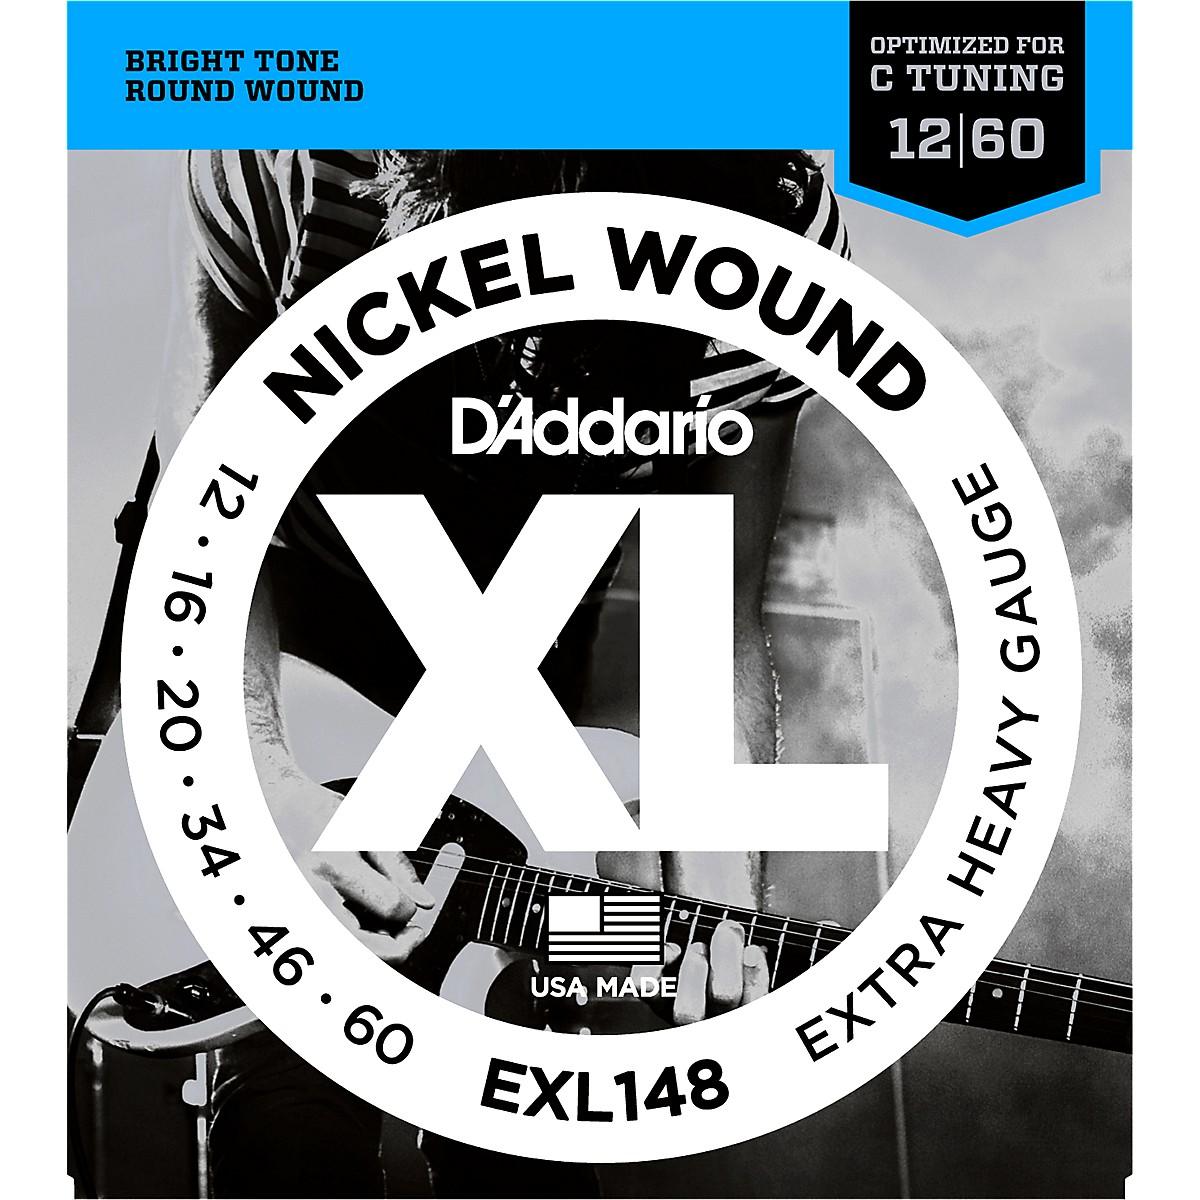 D'Addario XL148 Nickel-Wound, Drop C Tuning Electric Guitar Strings